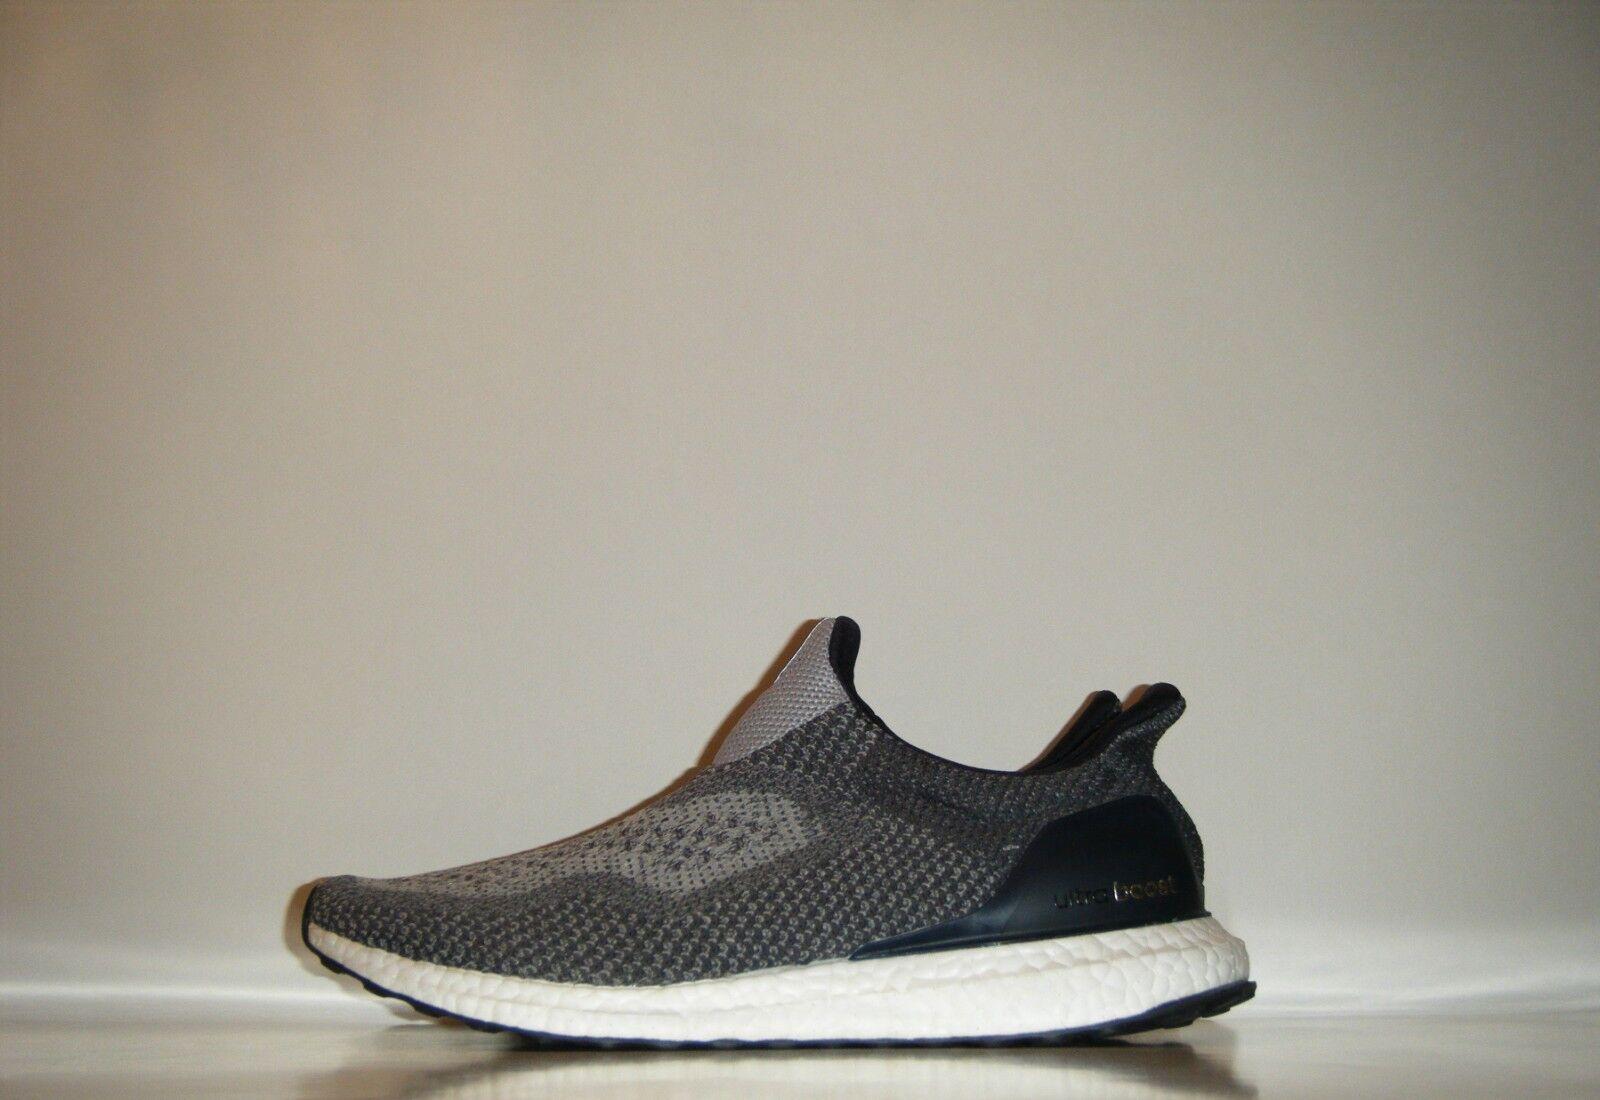 Adidas eigene ultra - impuls uncaged wolle grauen ltd ltd ltd stichprobe sz 2.0.11. primeknit dd2251